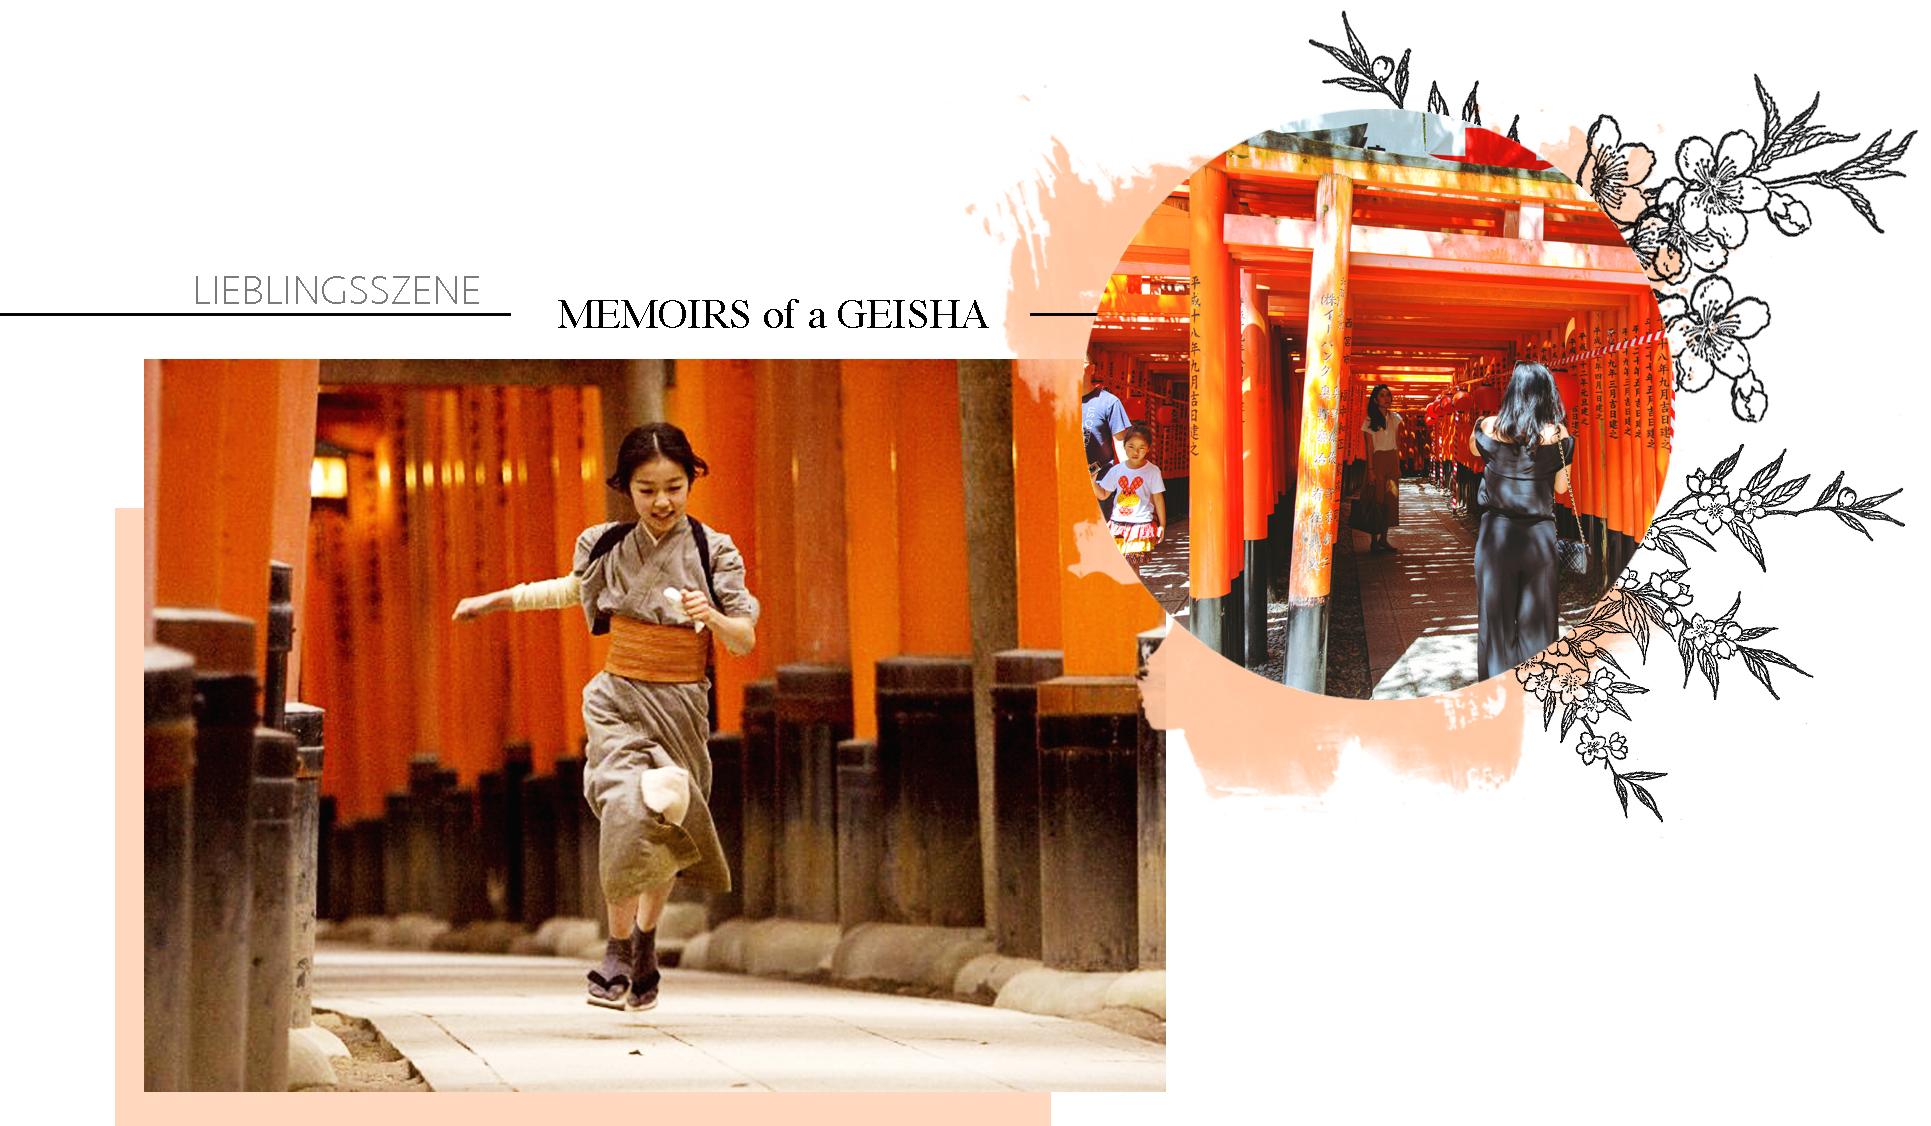 Memoirs of a Geisha Fushimi Inari-Taisha Torii Kyoto Japan